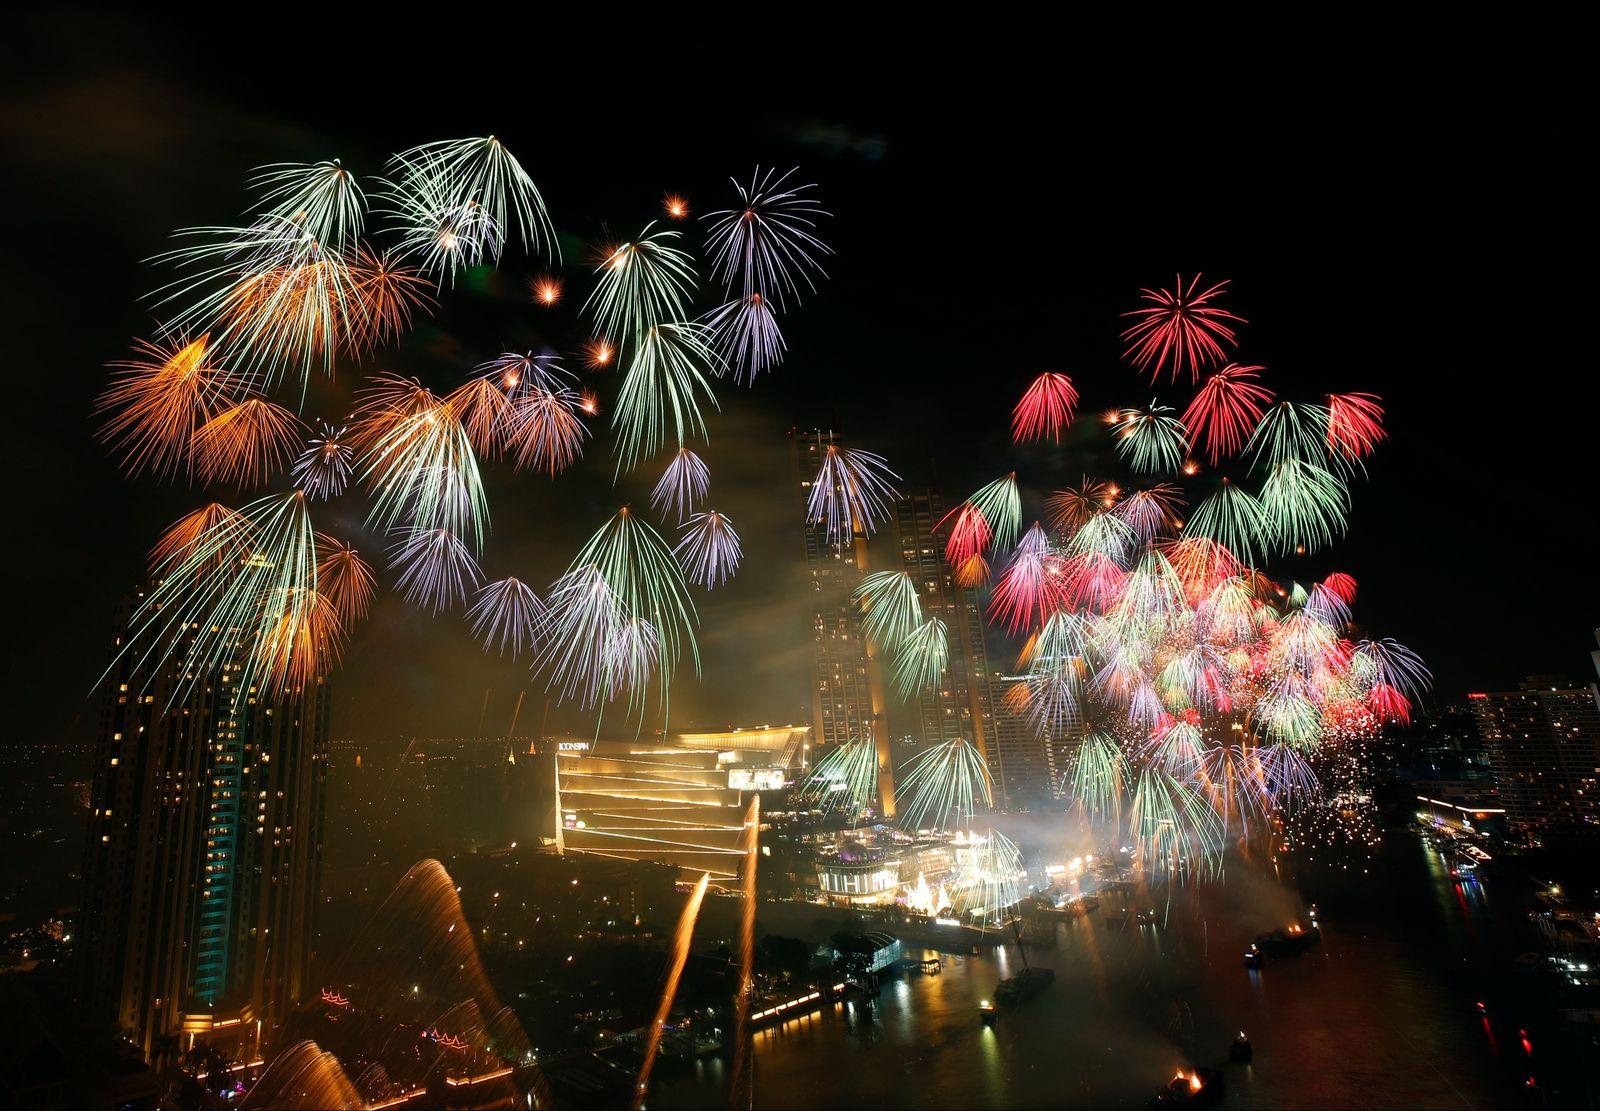 Thailand New Year countdown celebrations amid the COVID-19, Bangkok - 01 Jan 2021